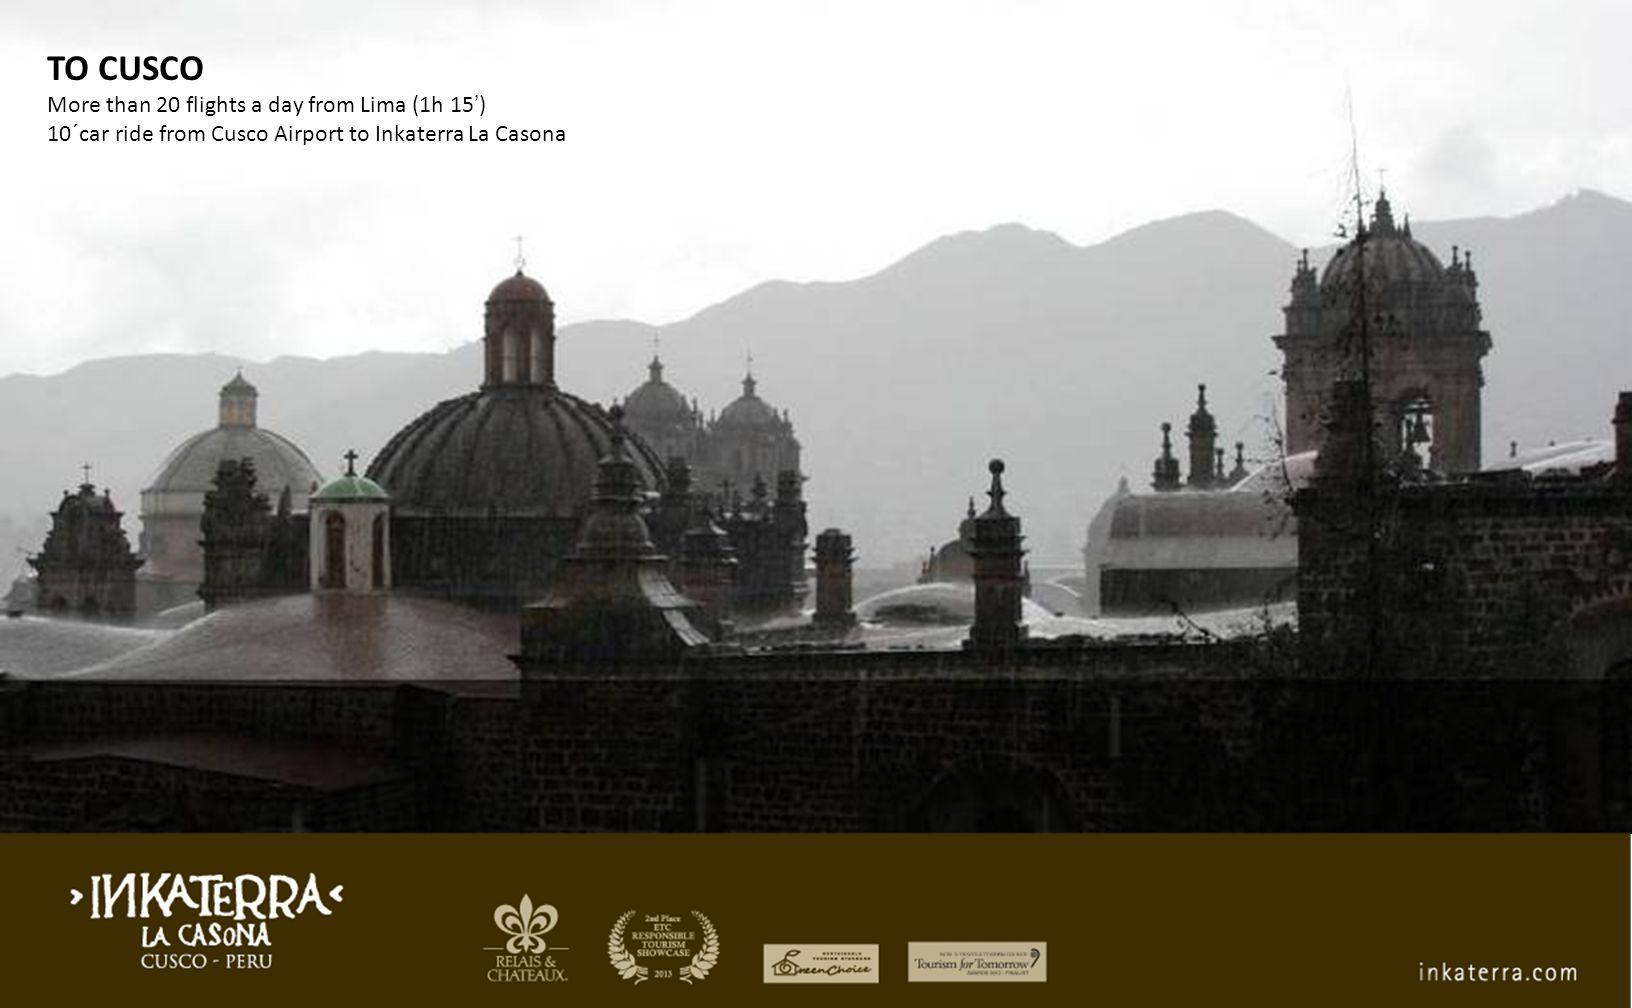 Gold List 2010 – 2011 - 2013 Inkaterra La Casona Condé Nast Traveler UK